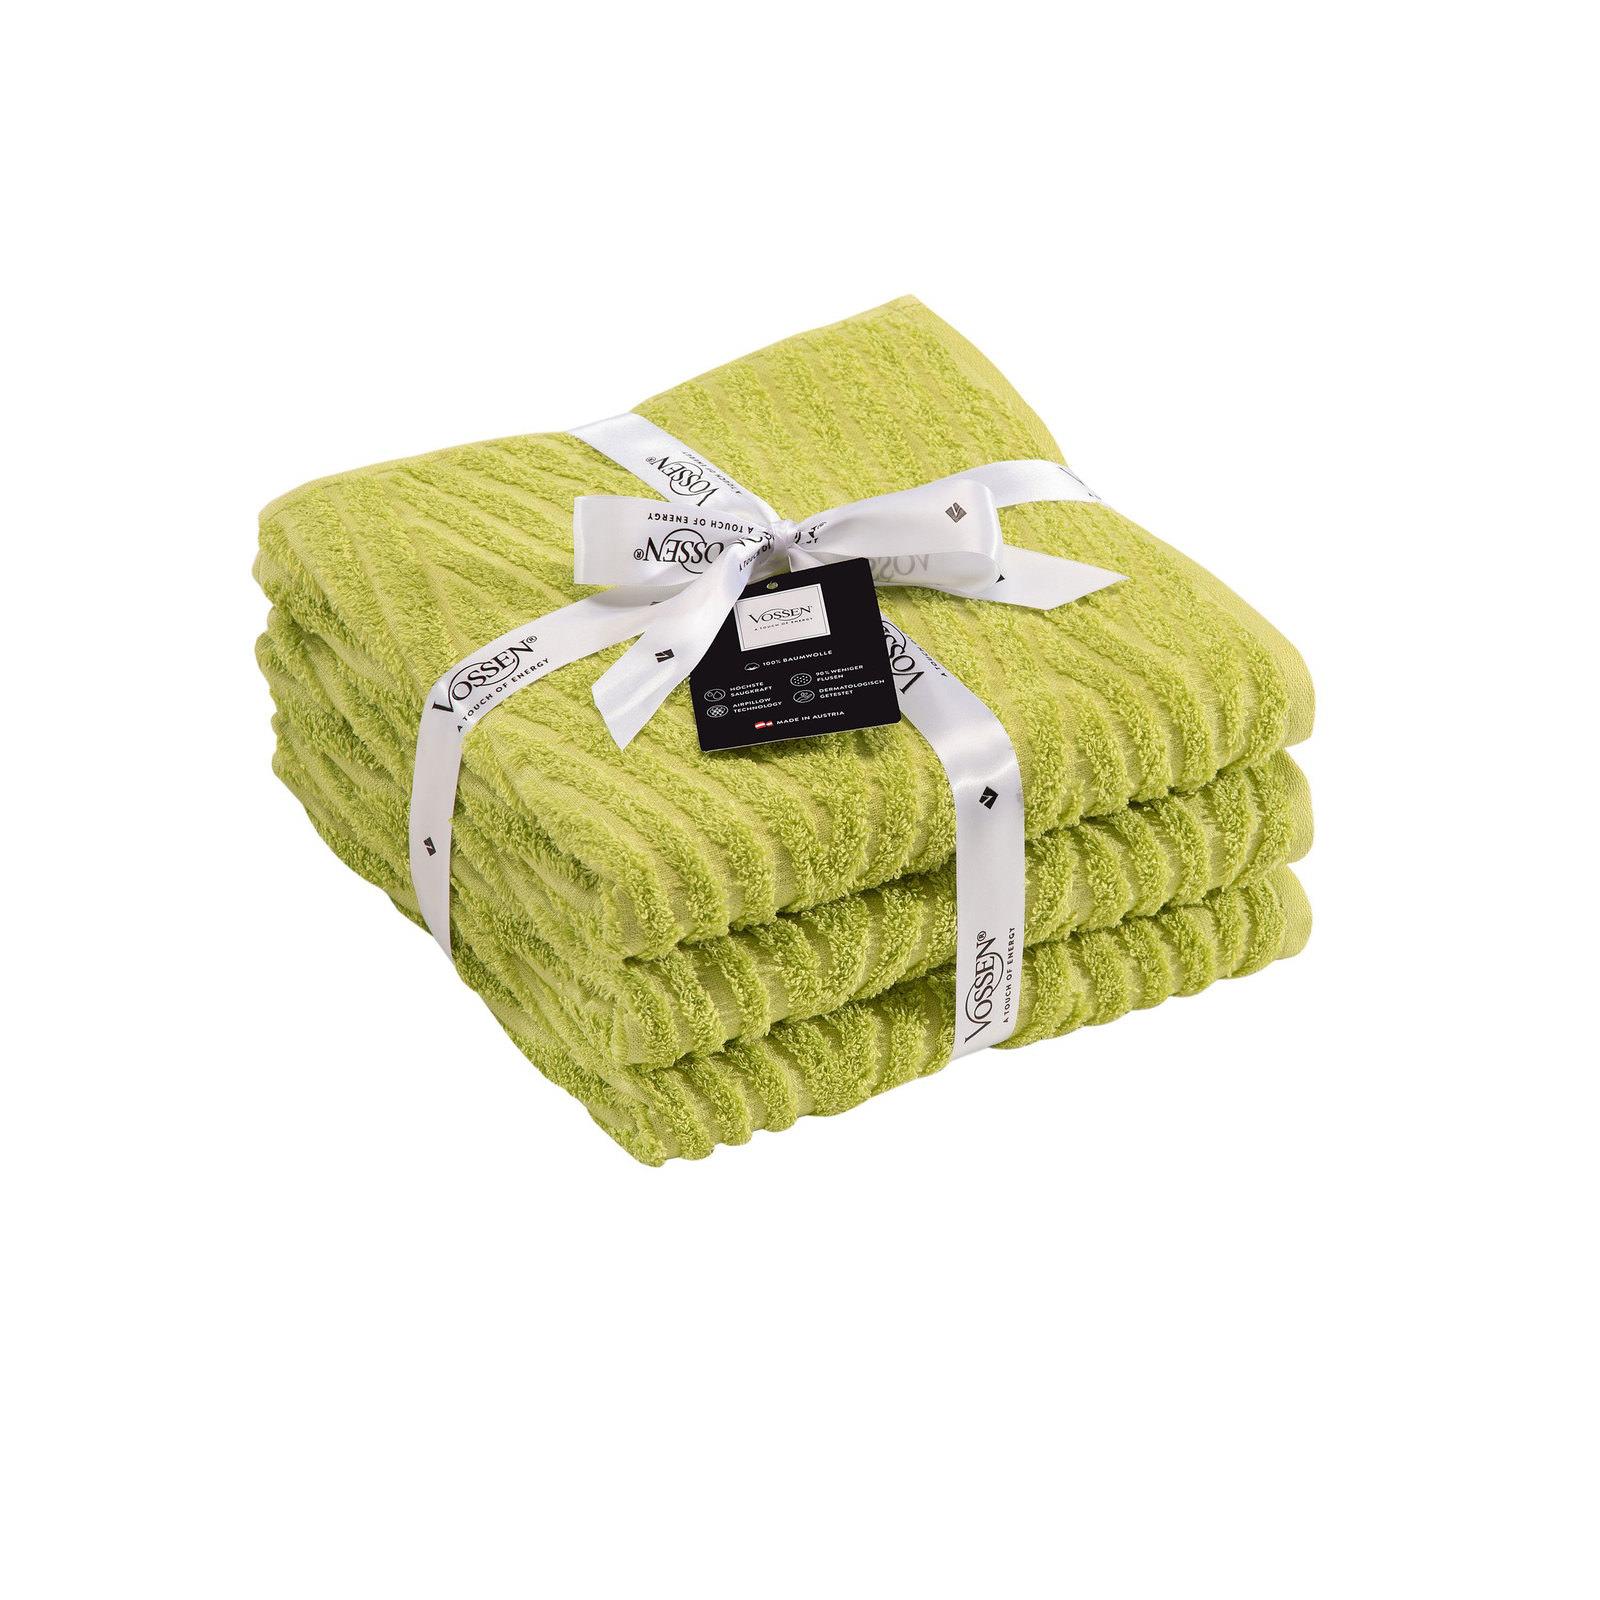 vossen handtuch set meadow green gr n online entdecken. Black Bedroom Furniture Sets. Home Design Ideas